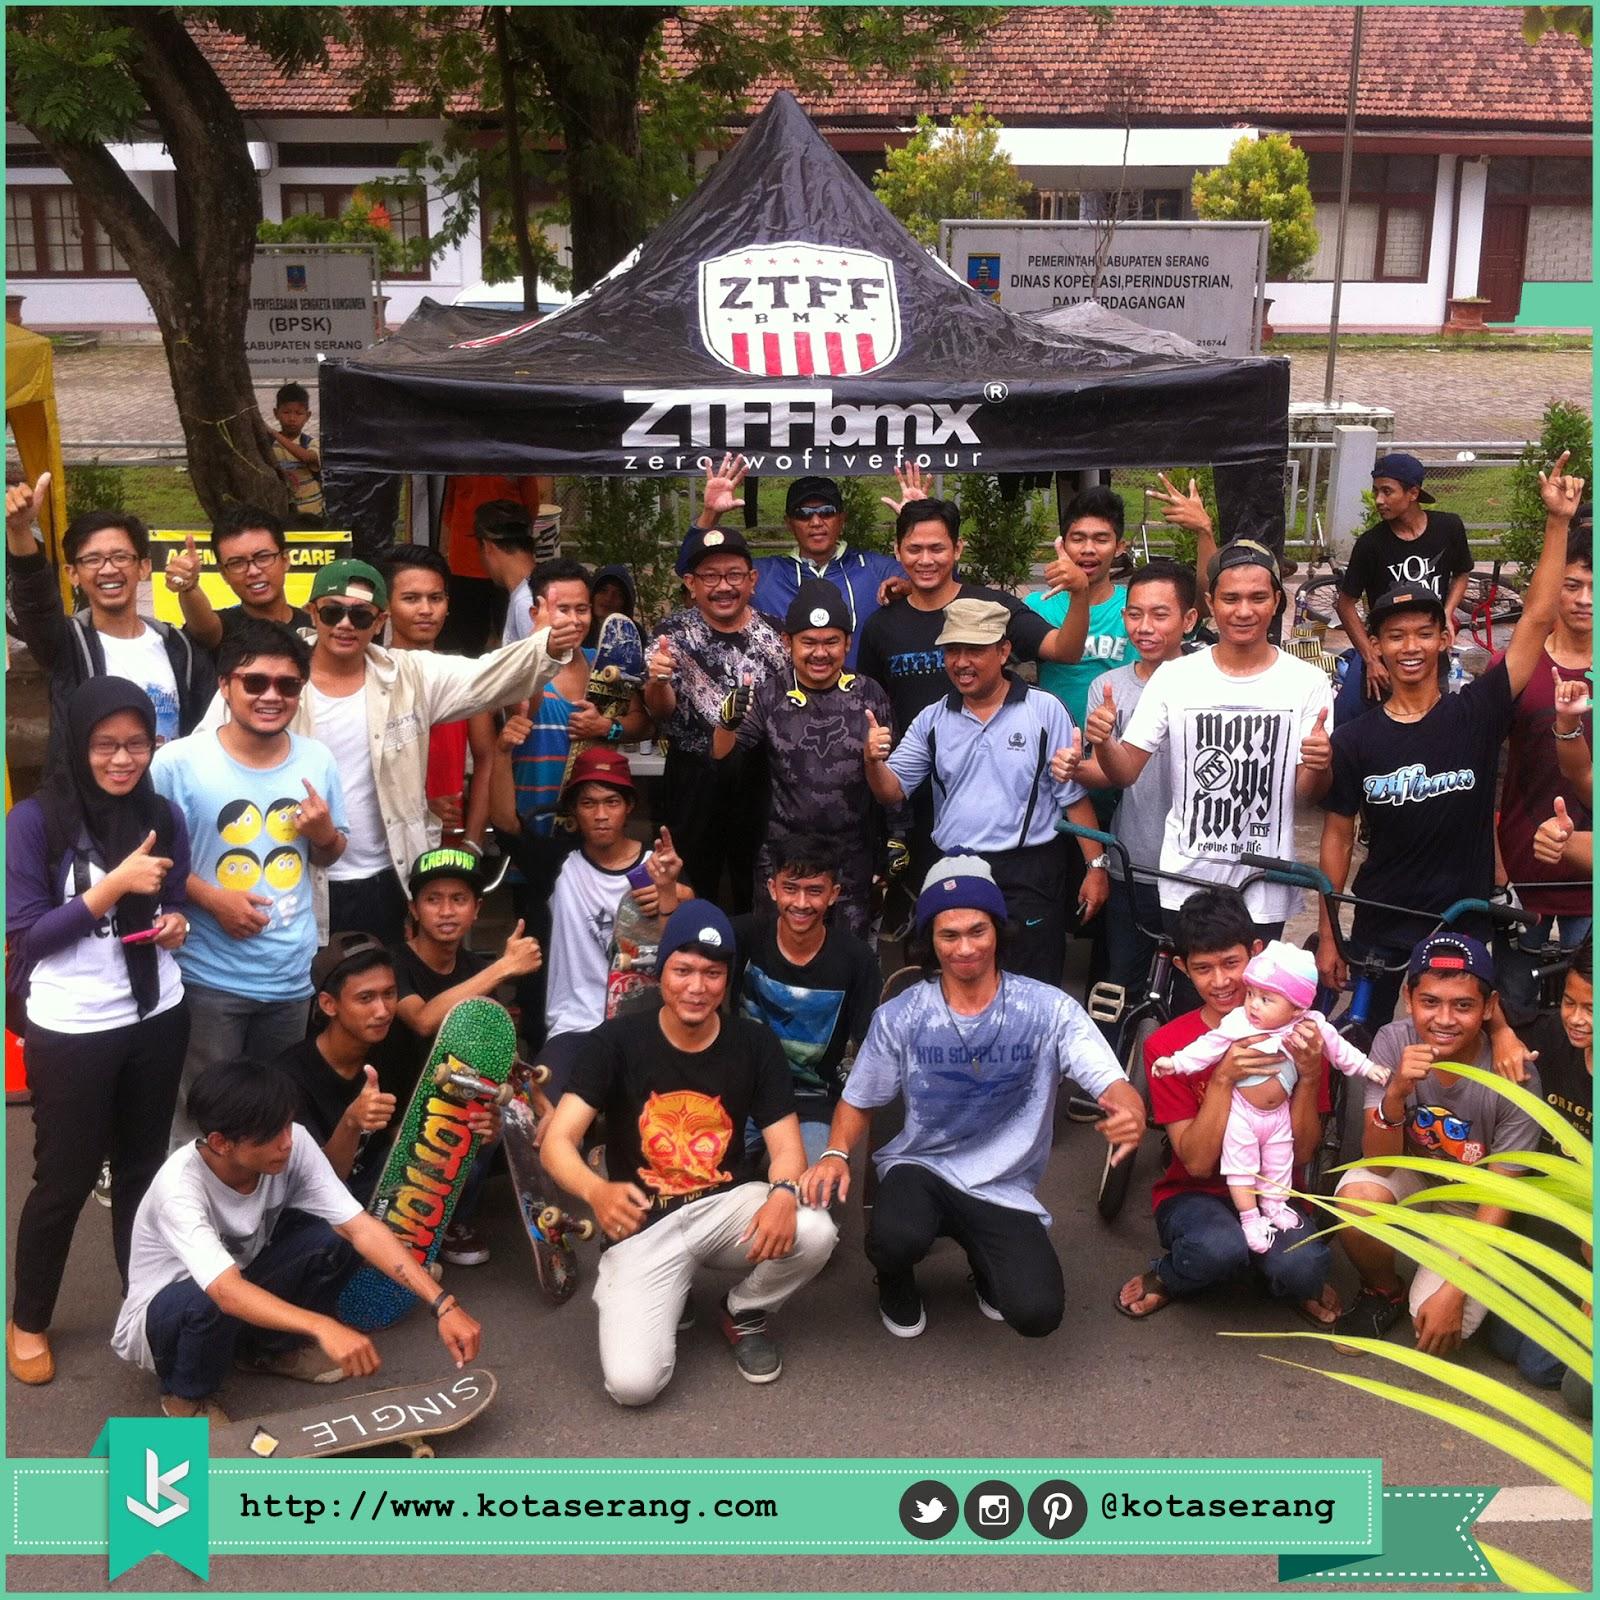 Partisipasi Walikota Serang Pada Acara Car Free Day @KotaSerang